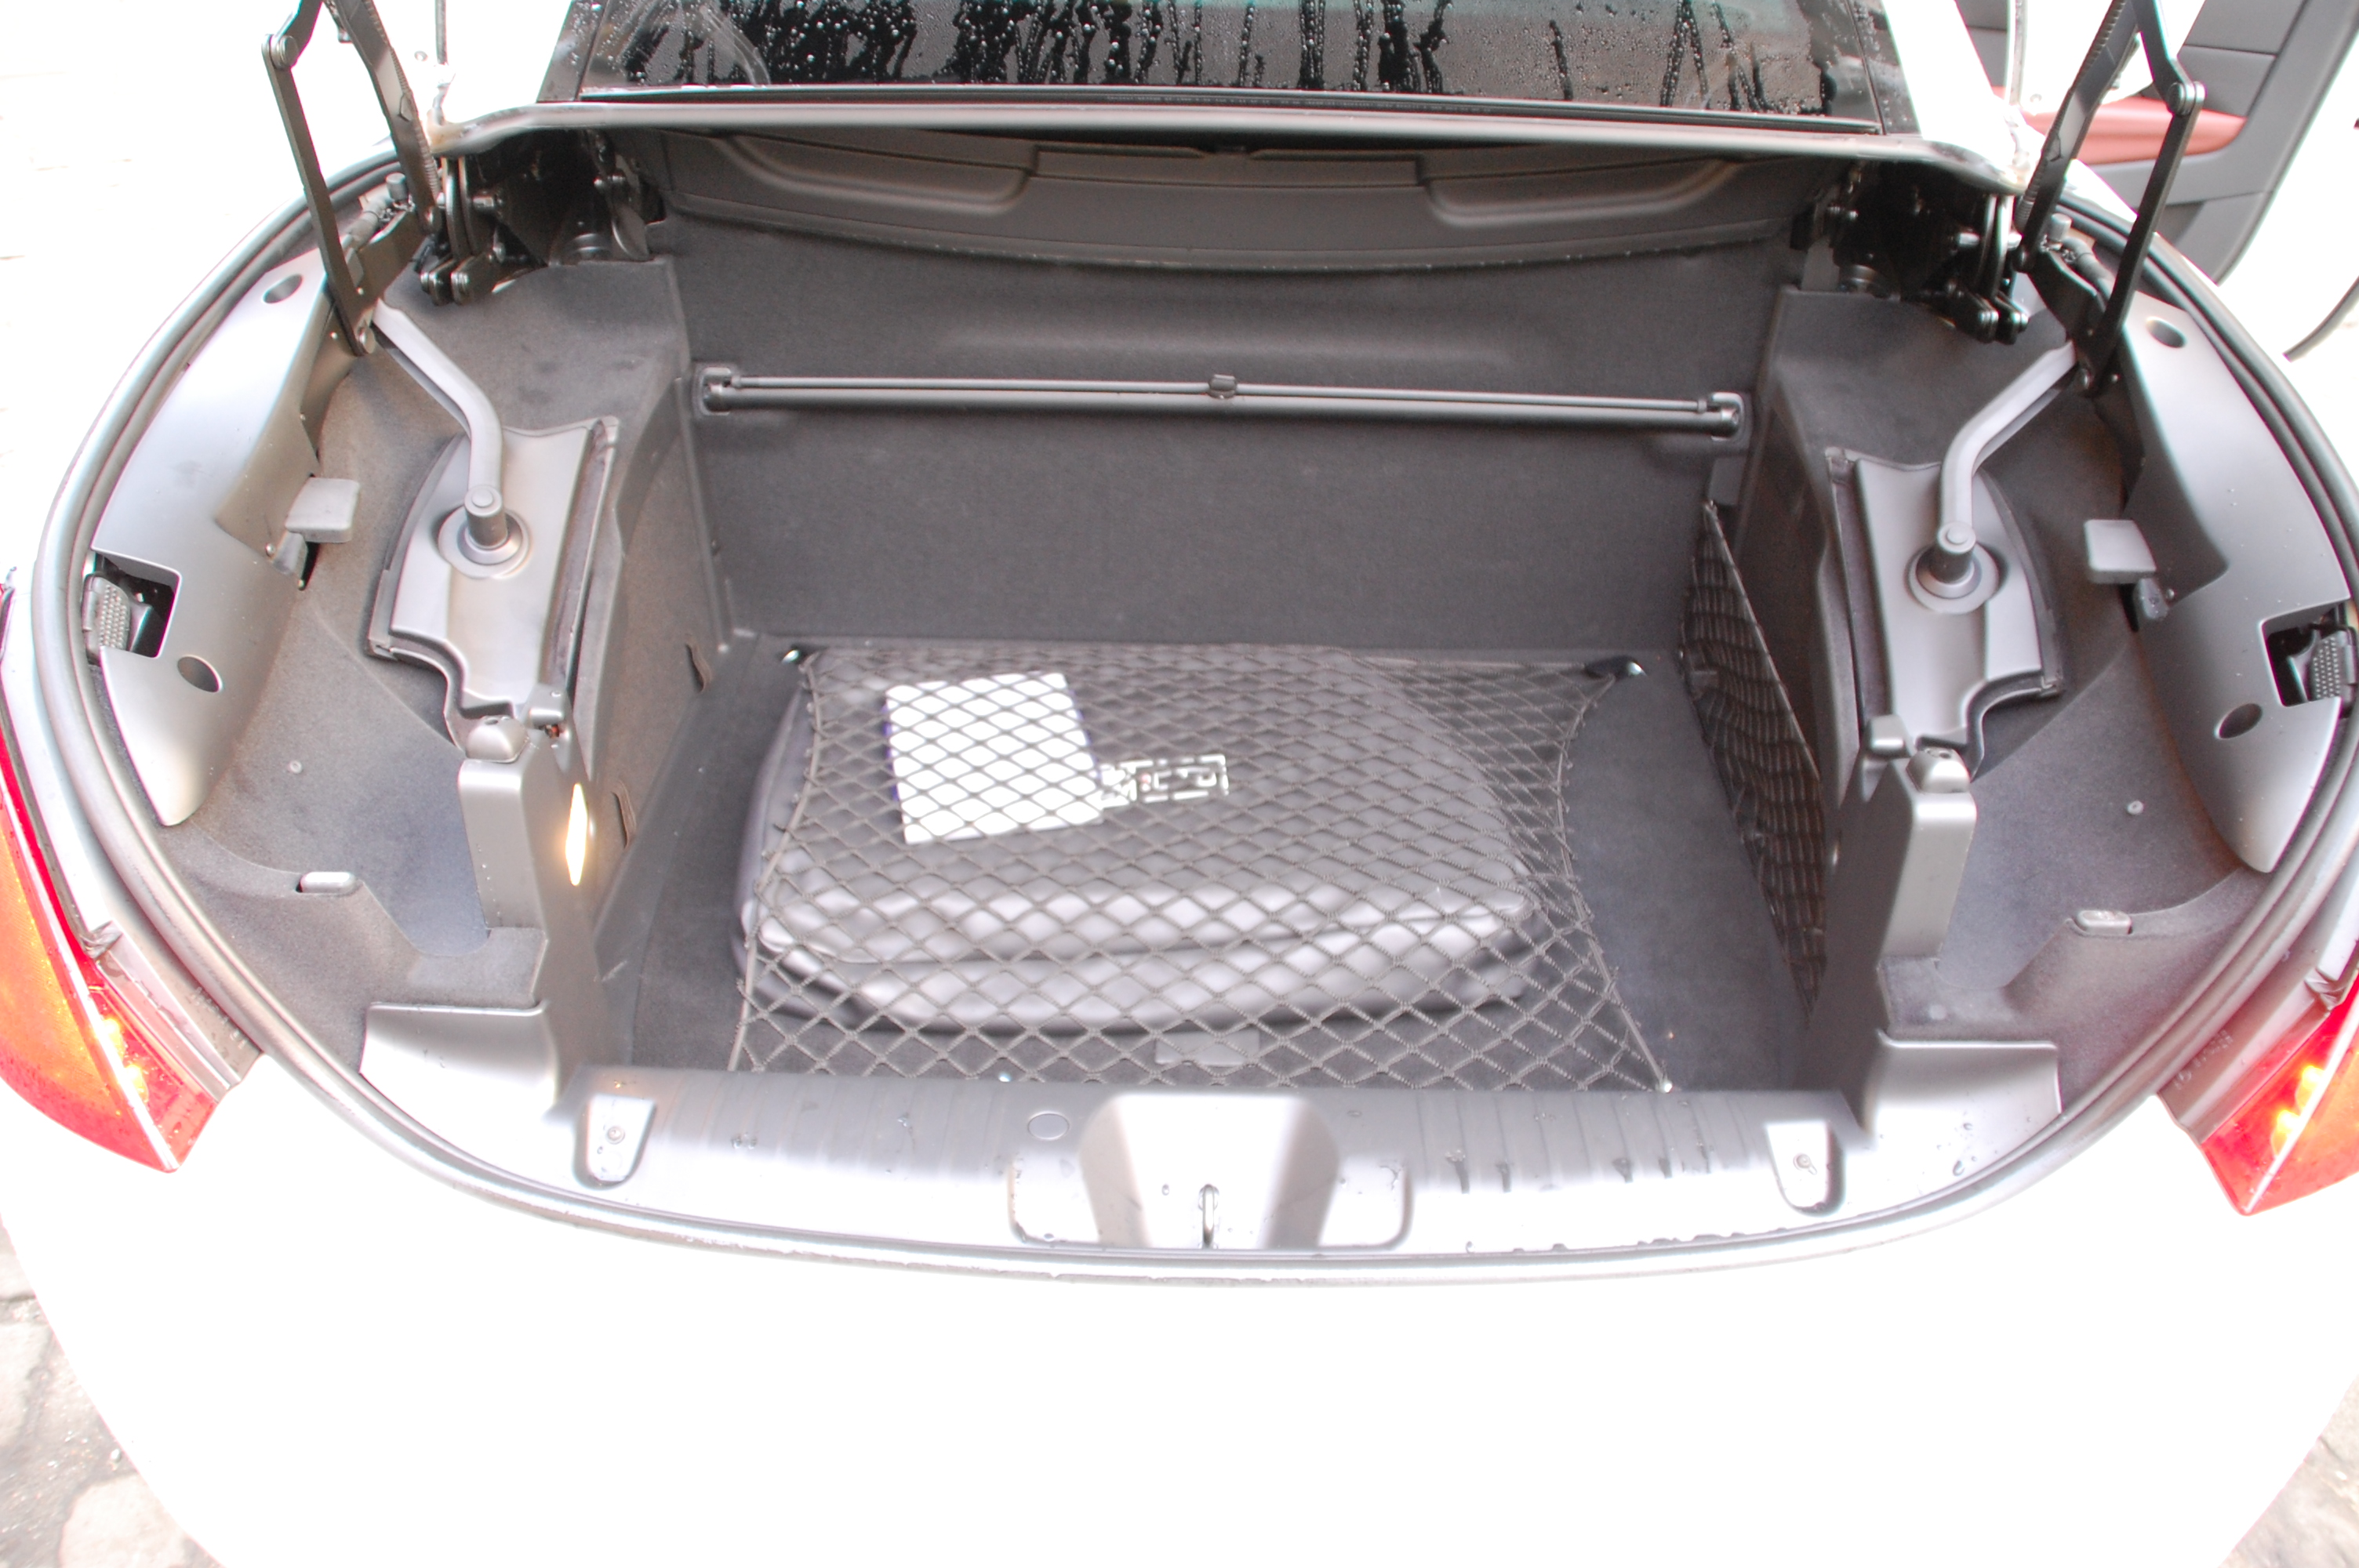 peugeot 308 cc gt thp 200 road test « petroleum vitae